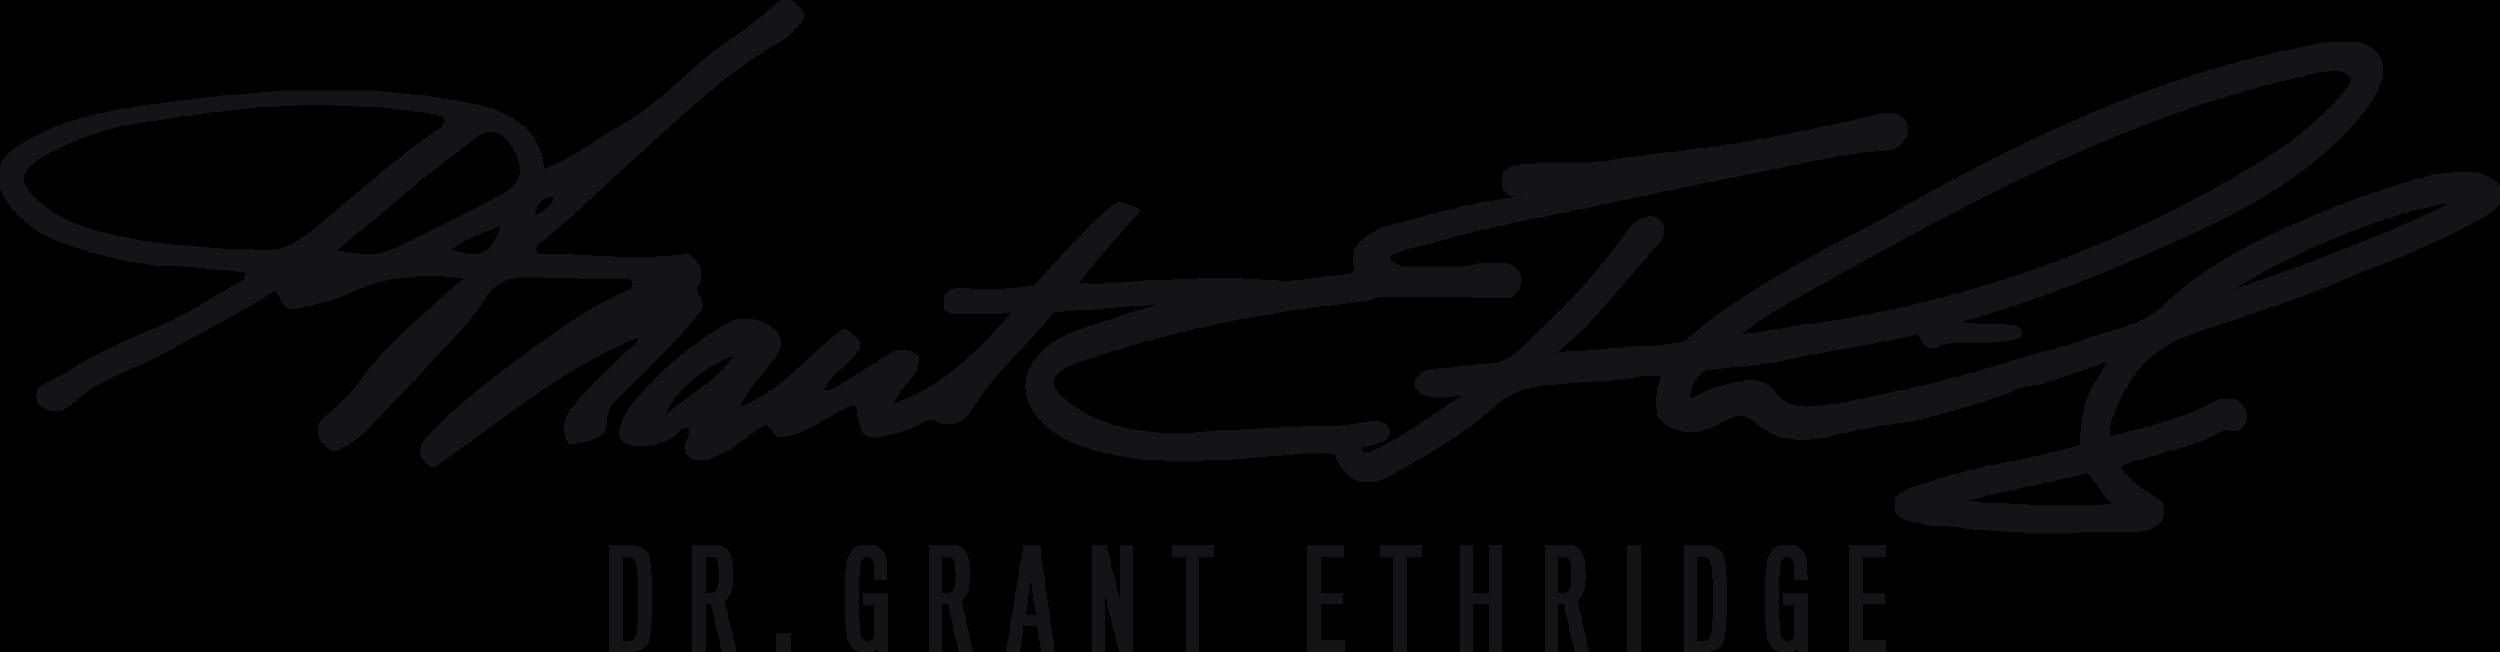 Grant Ethridge Logo.png